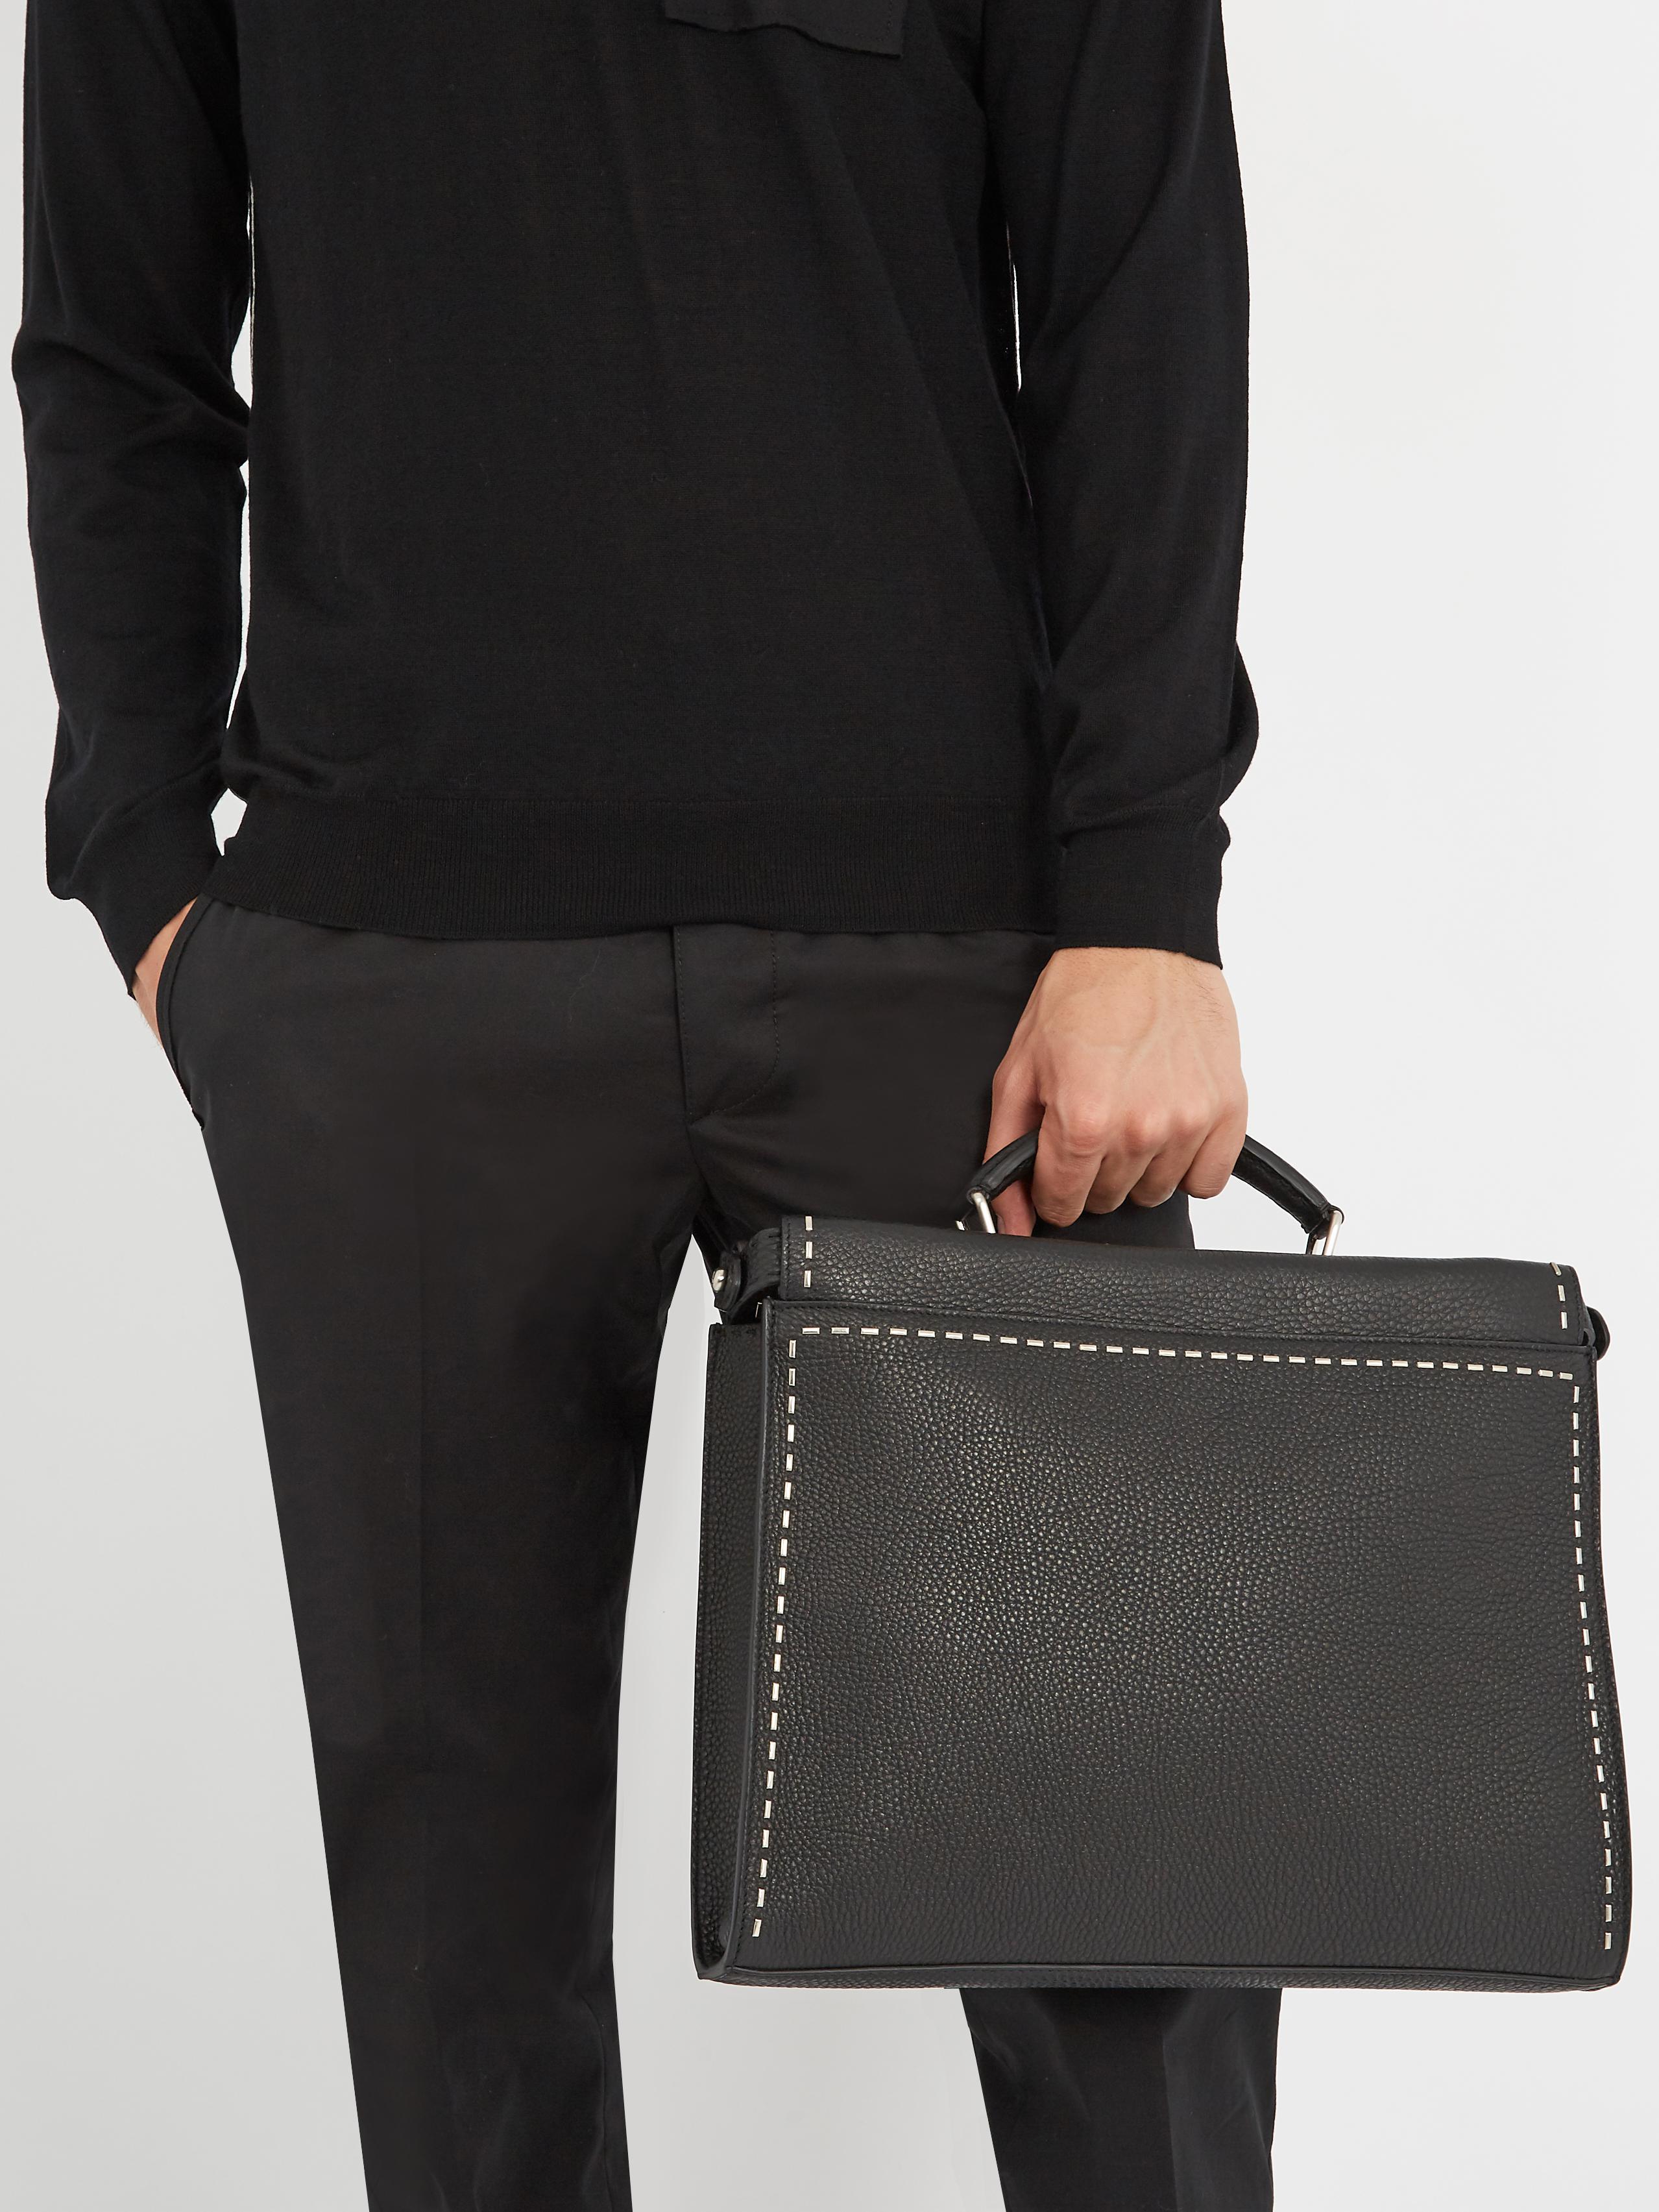 Fendi Metal Stitch Leather Briefcase in Black for Men - Lyst